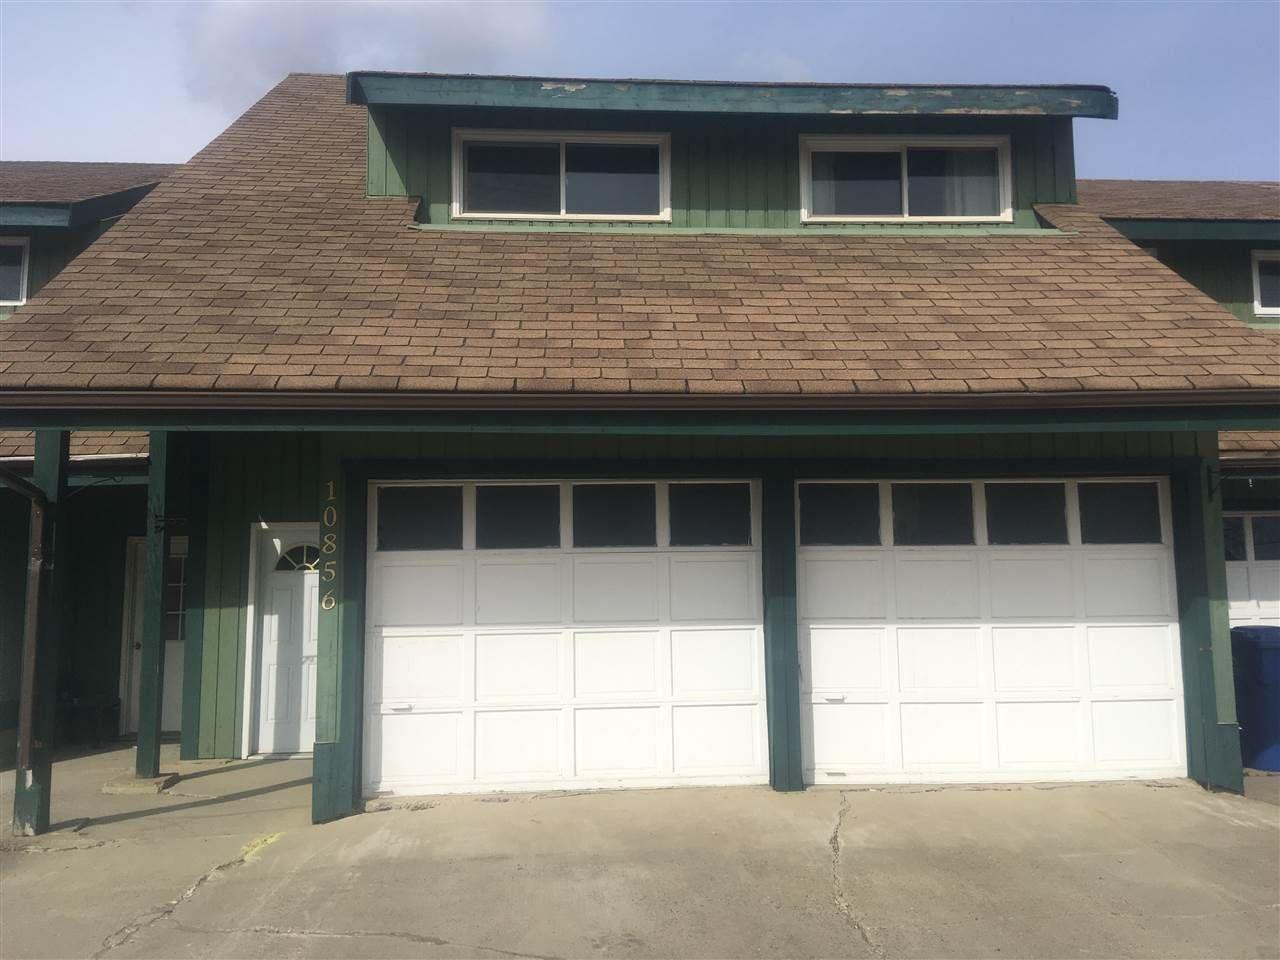 "Main Photo: 10856 102 Street in Fort St. John: Fort St. John - City NW Townhouse for sale in ""CEDAR VILLAGE"" (Fort St. John (Zone 60))  : MLS®# R2358709"